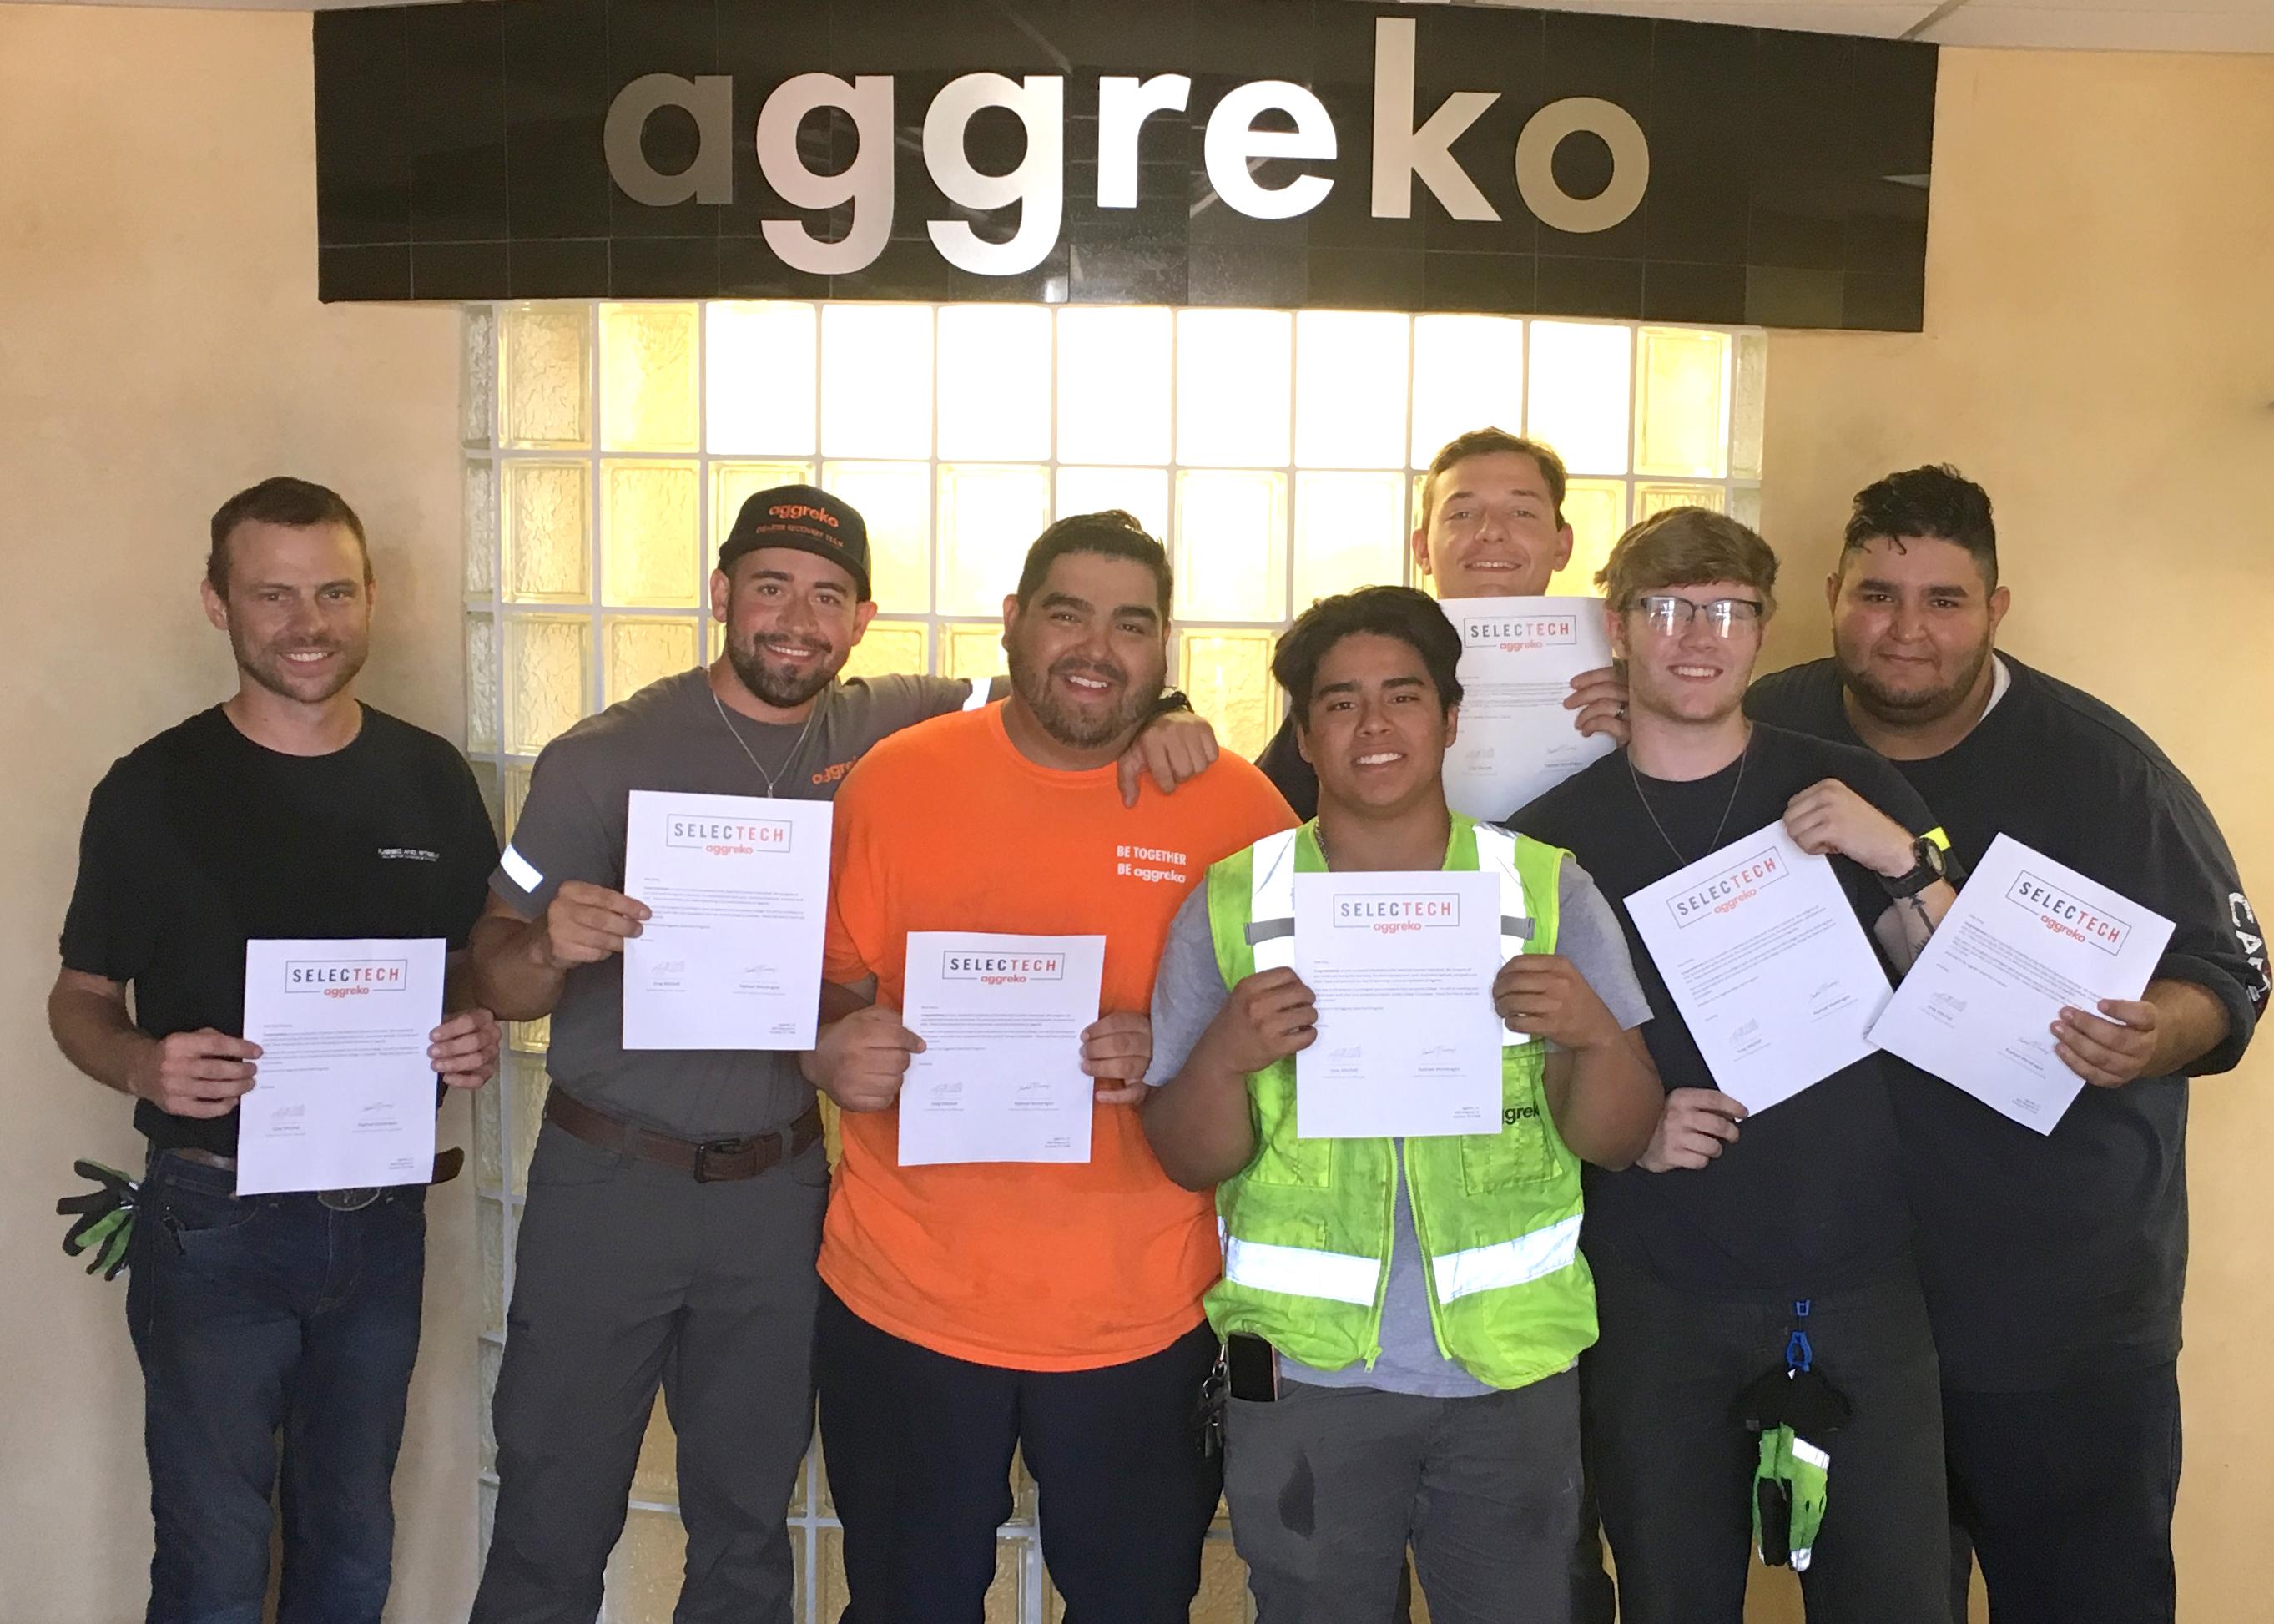 San Jacinto College Partners with Aggreko SelecTech Program